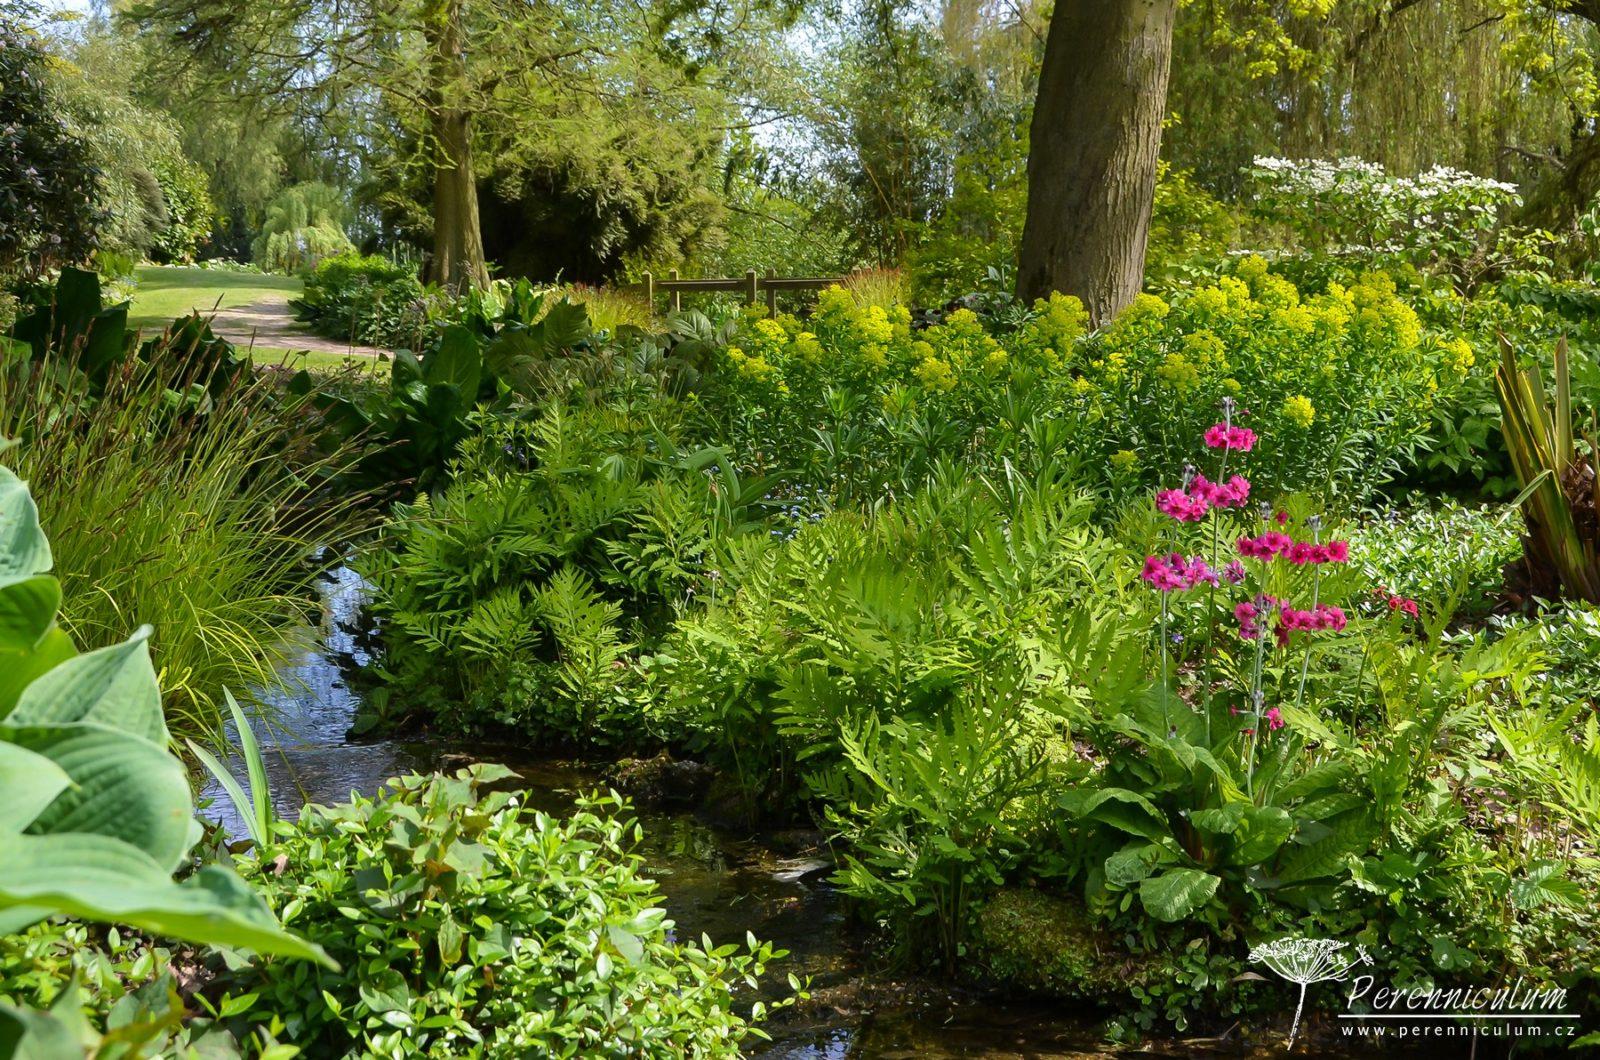 Podél potůčku kvetly patrovité petrklíše (<em>Primula pulverulenta</em>) doplňované kapradinami (<em>Onoclea sensibilis</em>) či kvetoucím pryšcem (<em>Euphorbia</em>).